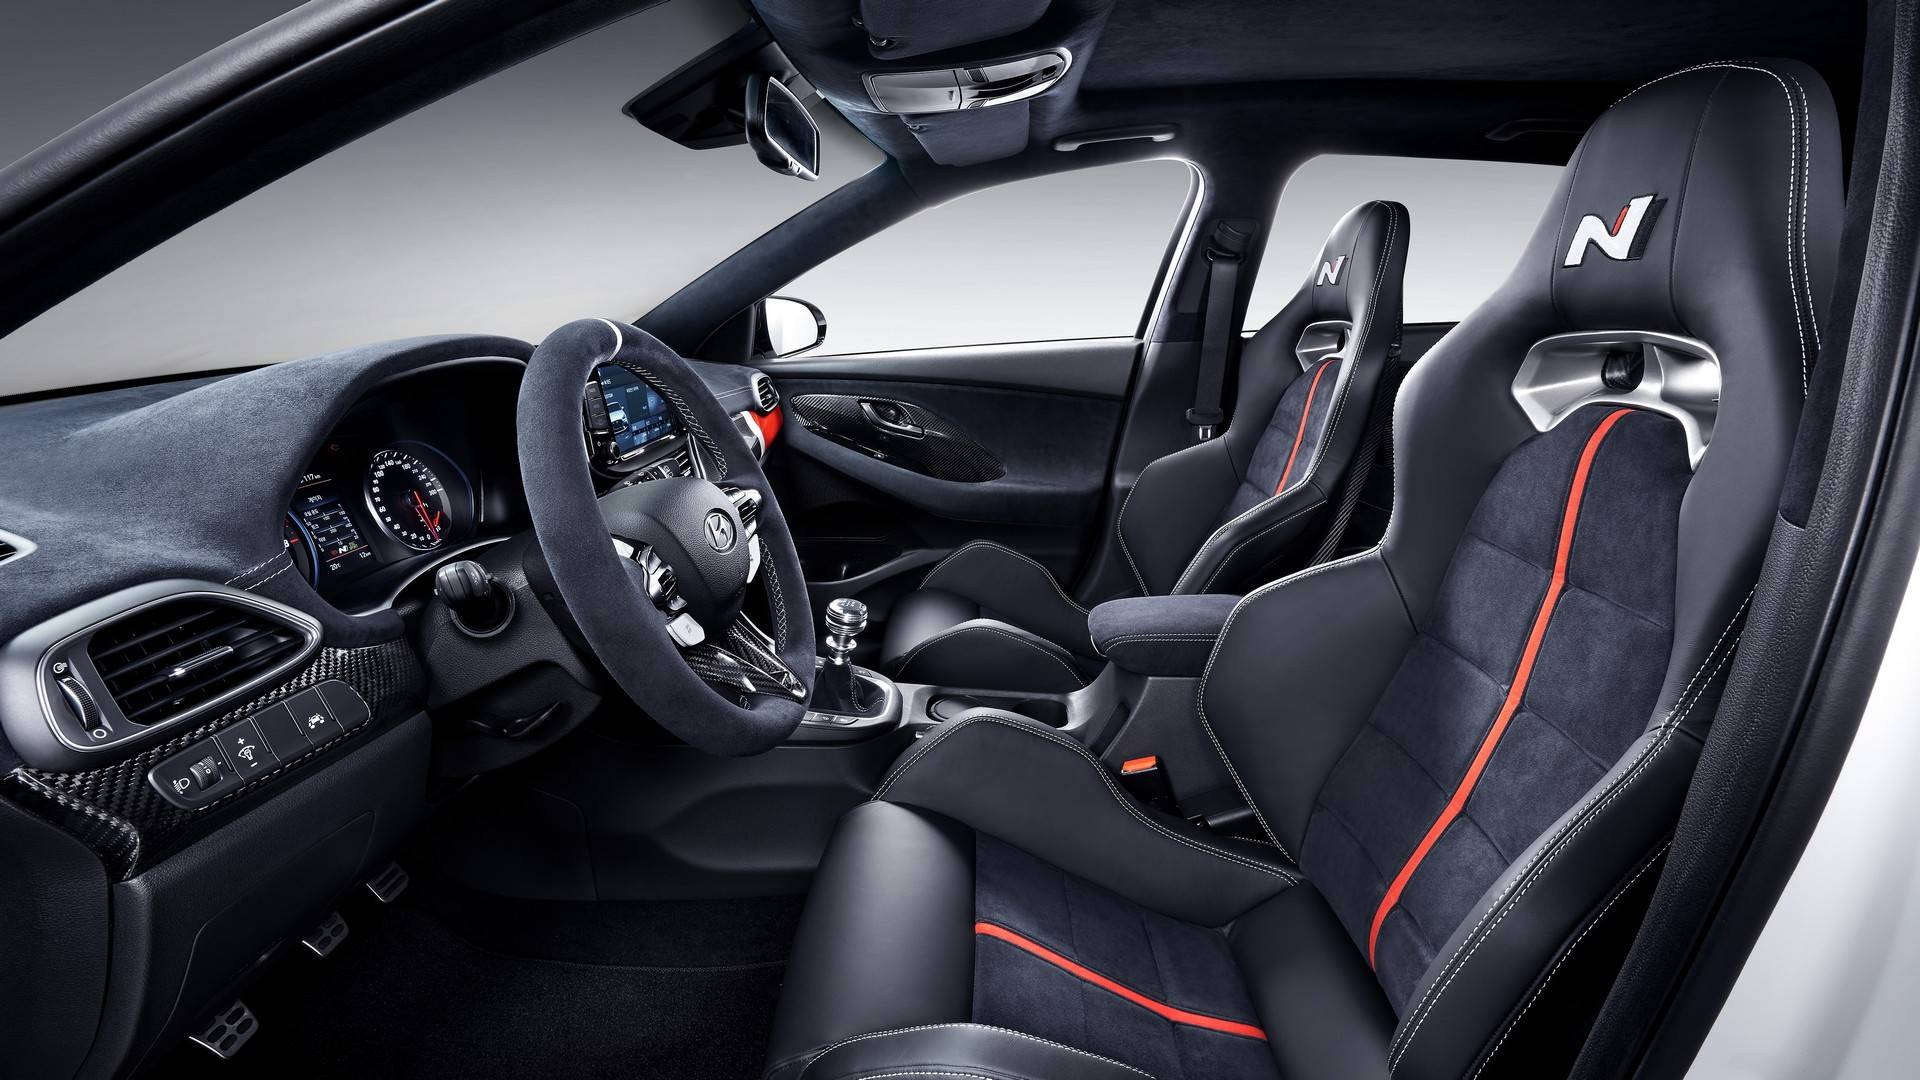 Hyundai i30 N Project C poluchit karbonovyj kapot 1